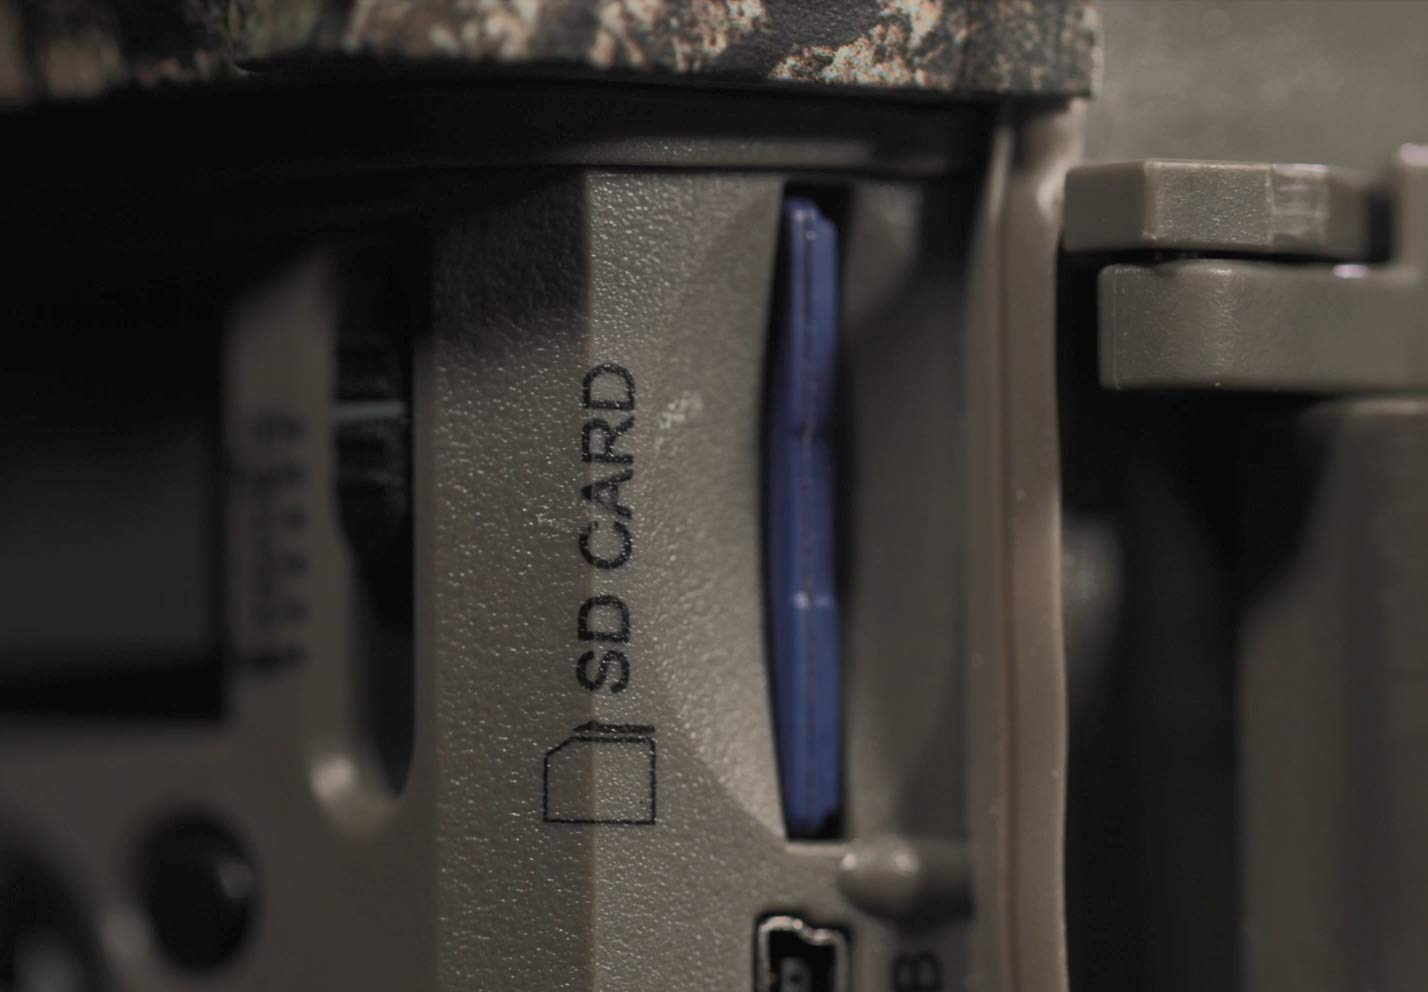 Stealth Cam G45NGMAX 26 MP 1080P Game Camera, Next Gen Night Imaging, Fast Trigger, Low Light Sensitivity, Blur Reduction, Smart Illumination Technology